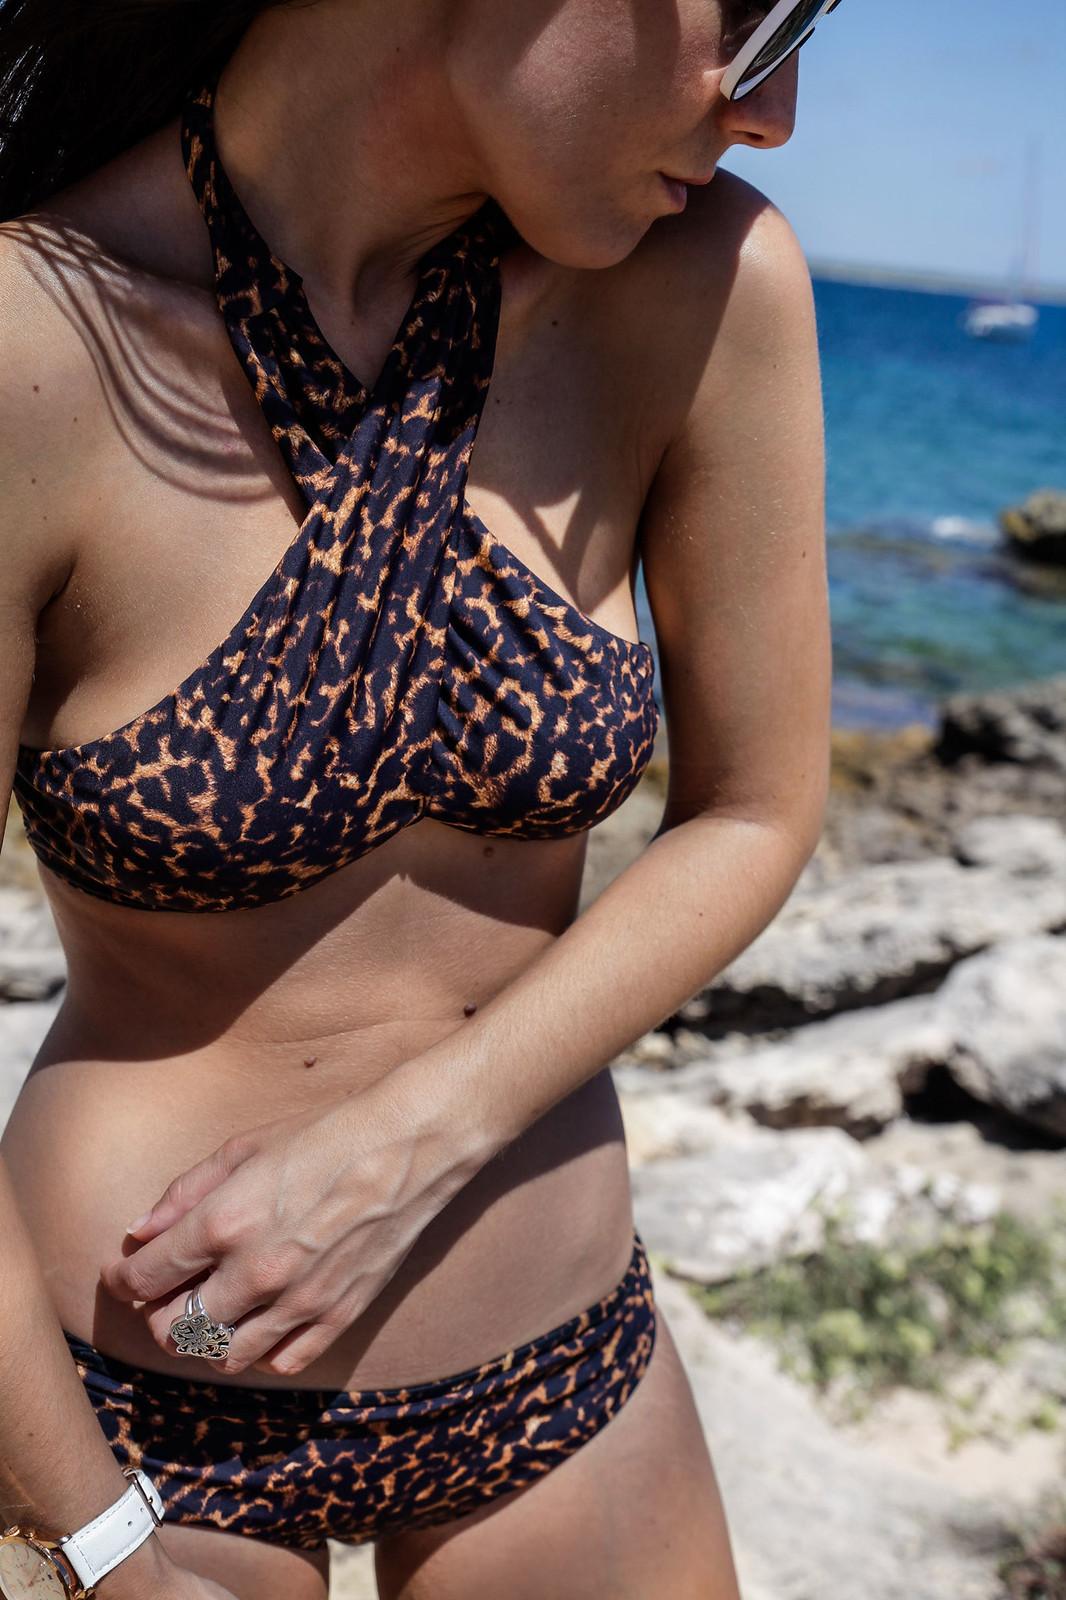 05_beachriot_leopard_swimwear_theguestgirl_summer_the_guest_girl_laura_santolaria_mediterranean_girl_mejor_bañador_2017_bikini_sexy_laura